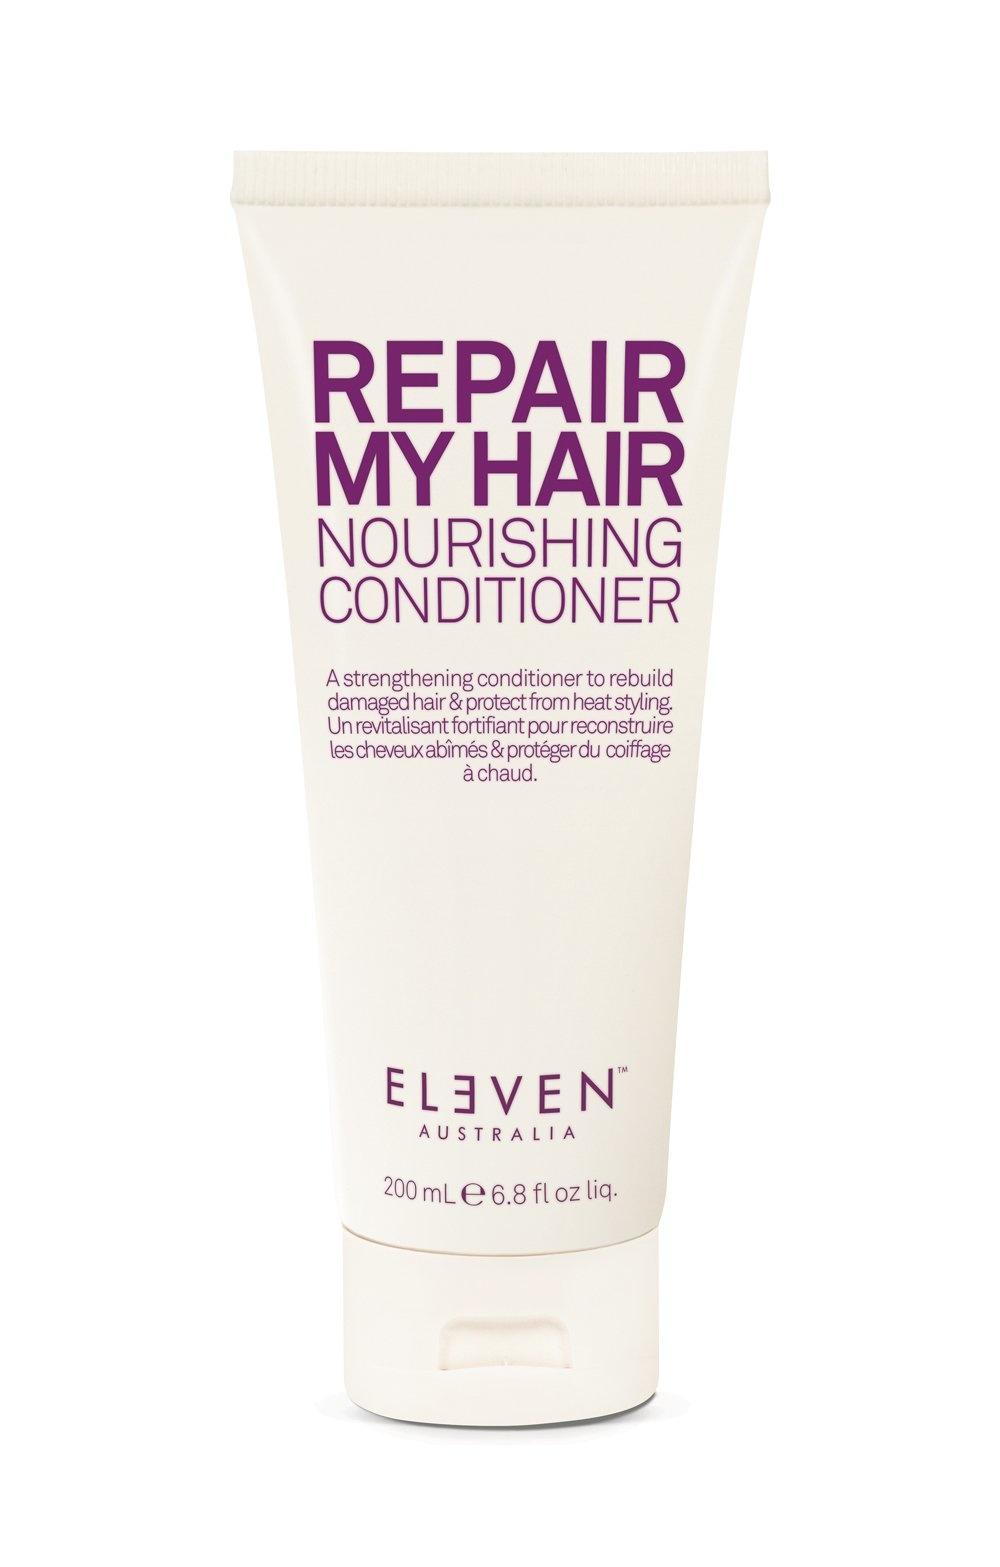 Eleven Australia Repair My Hair Nourishing Conditioner